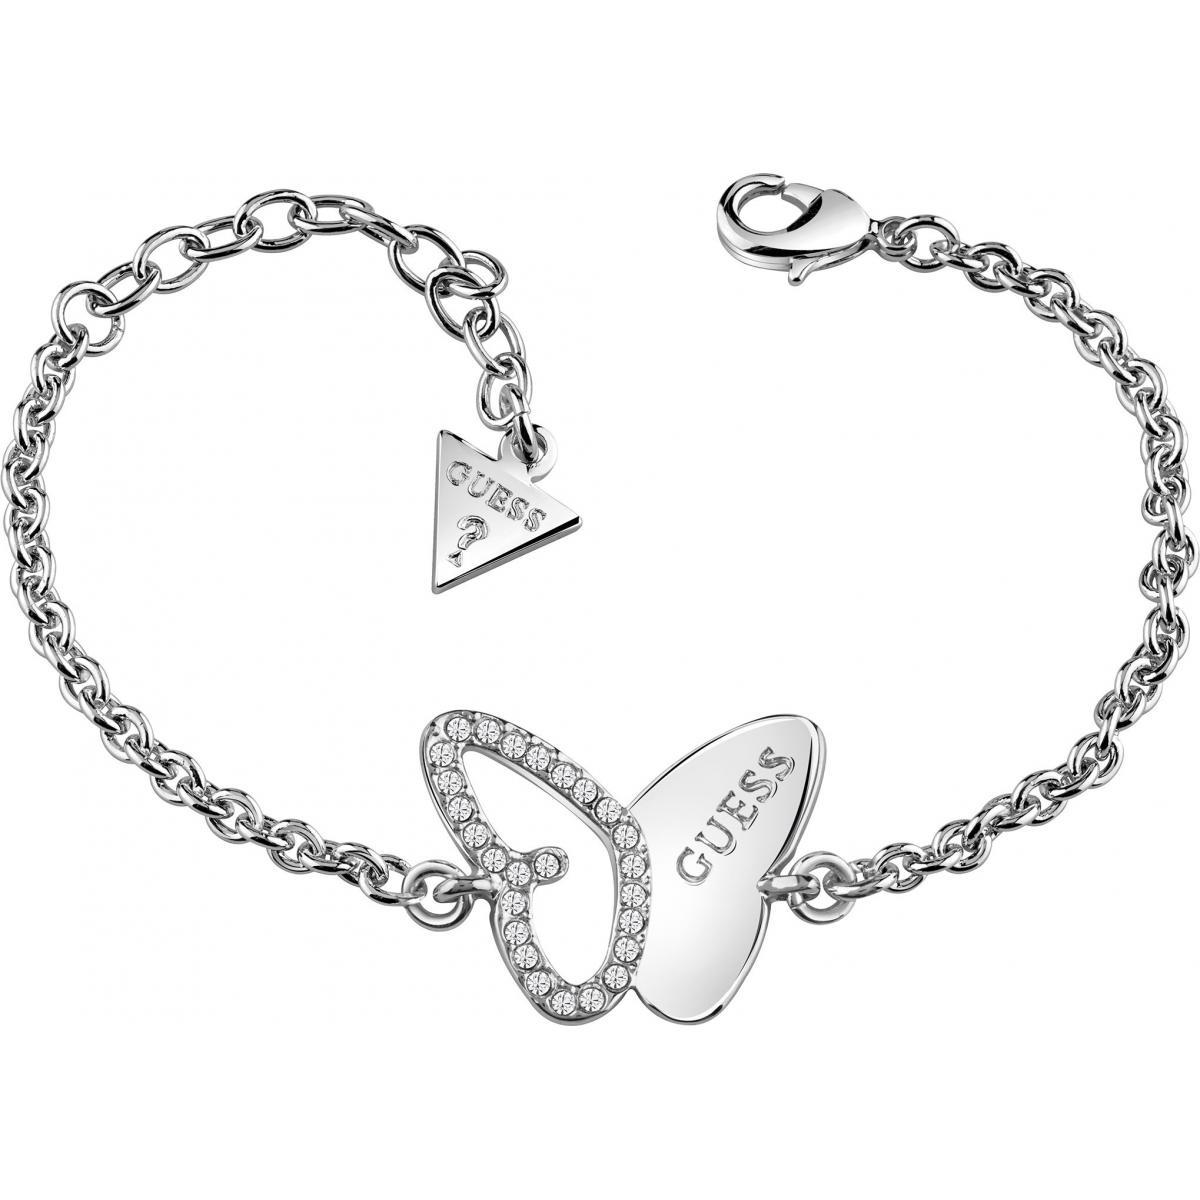 bracelet femme papillon